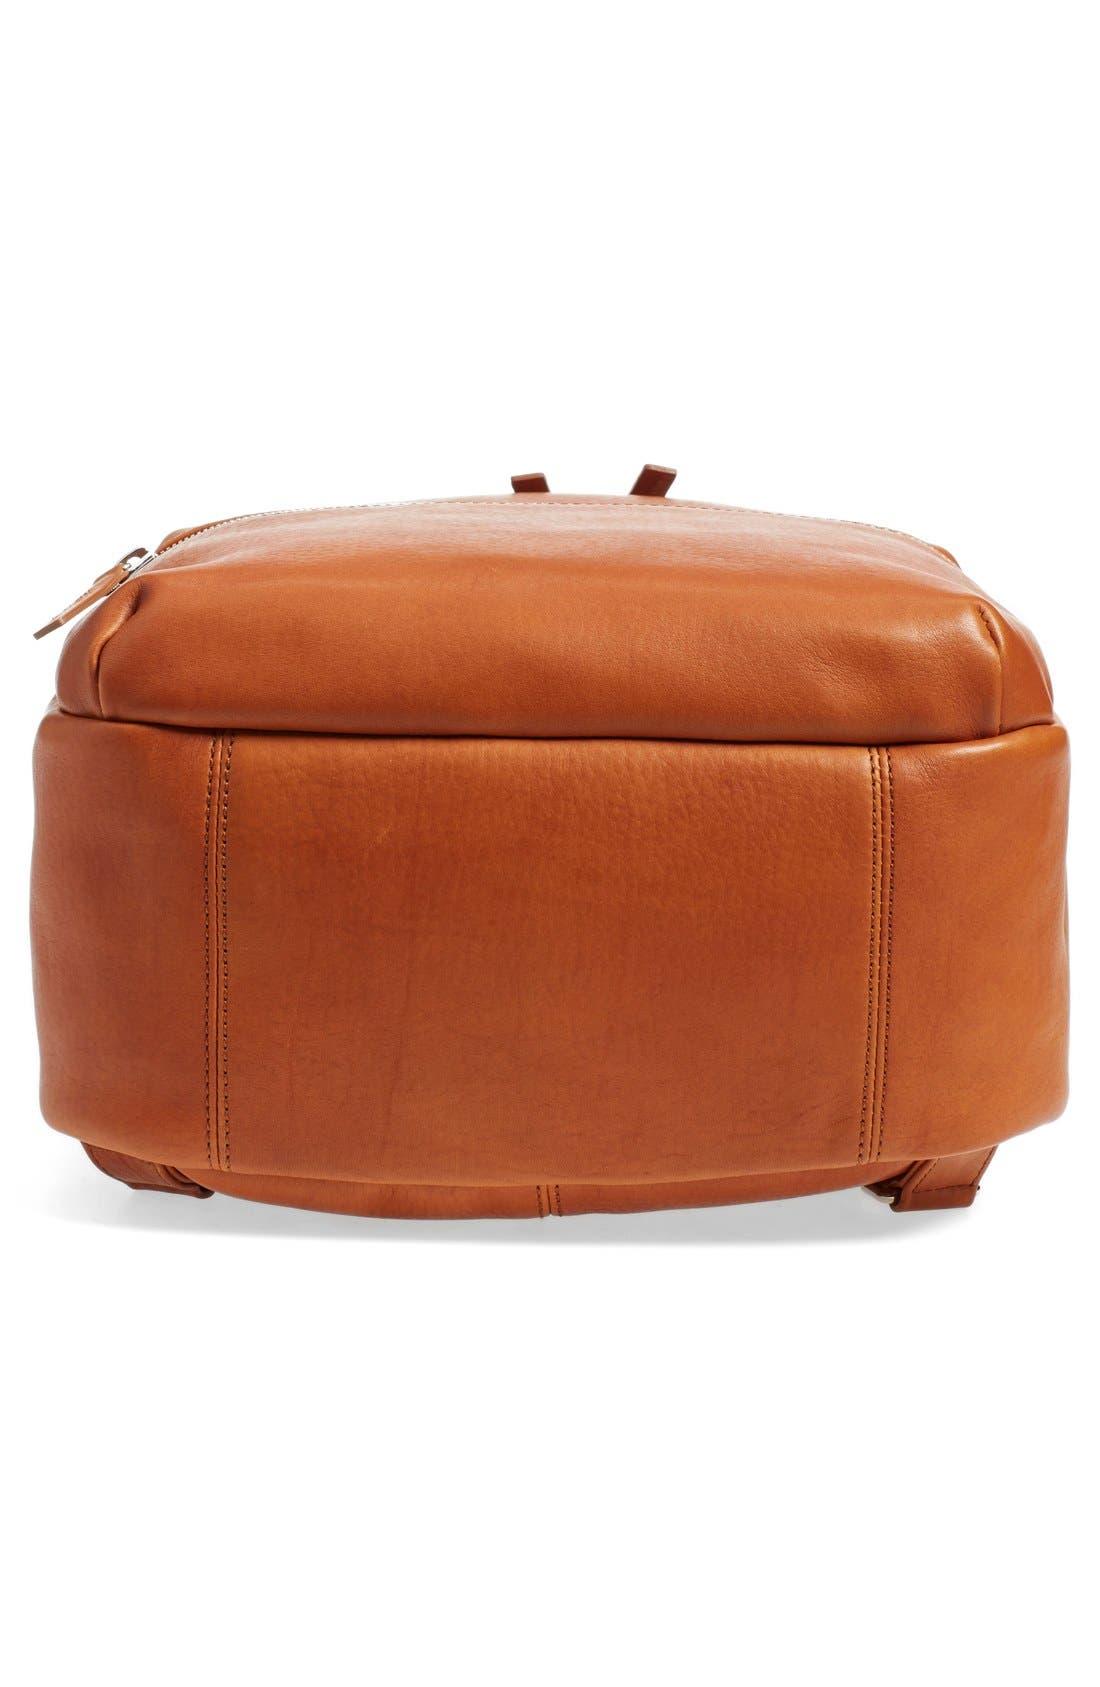 Runwell Leather Laptop Backpack,                             Alternate thumbnail 6, color,                             Bourbon